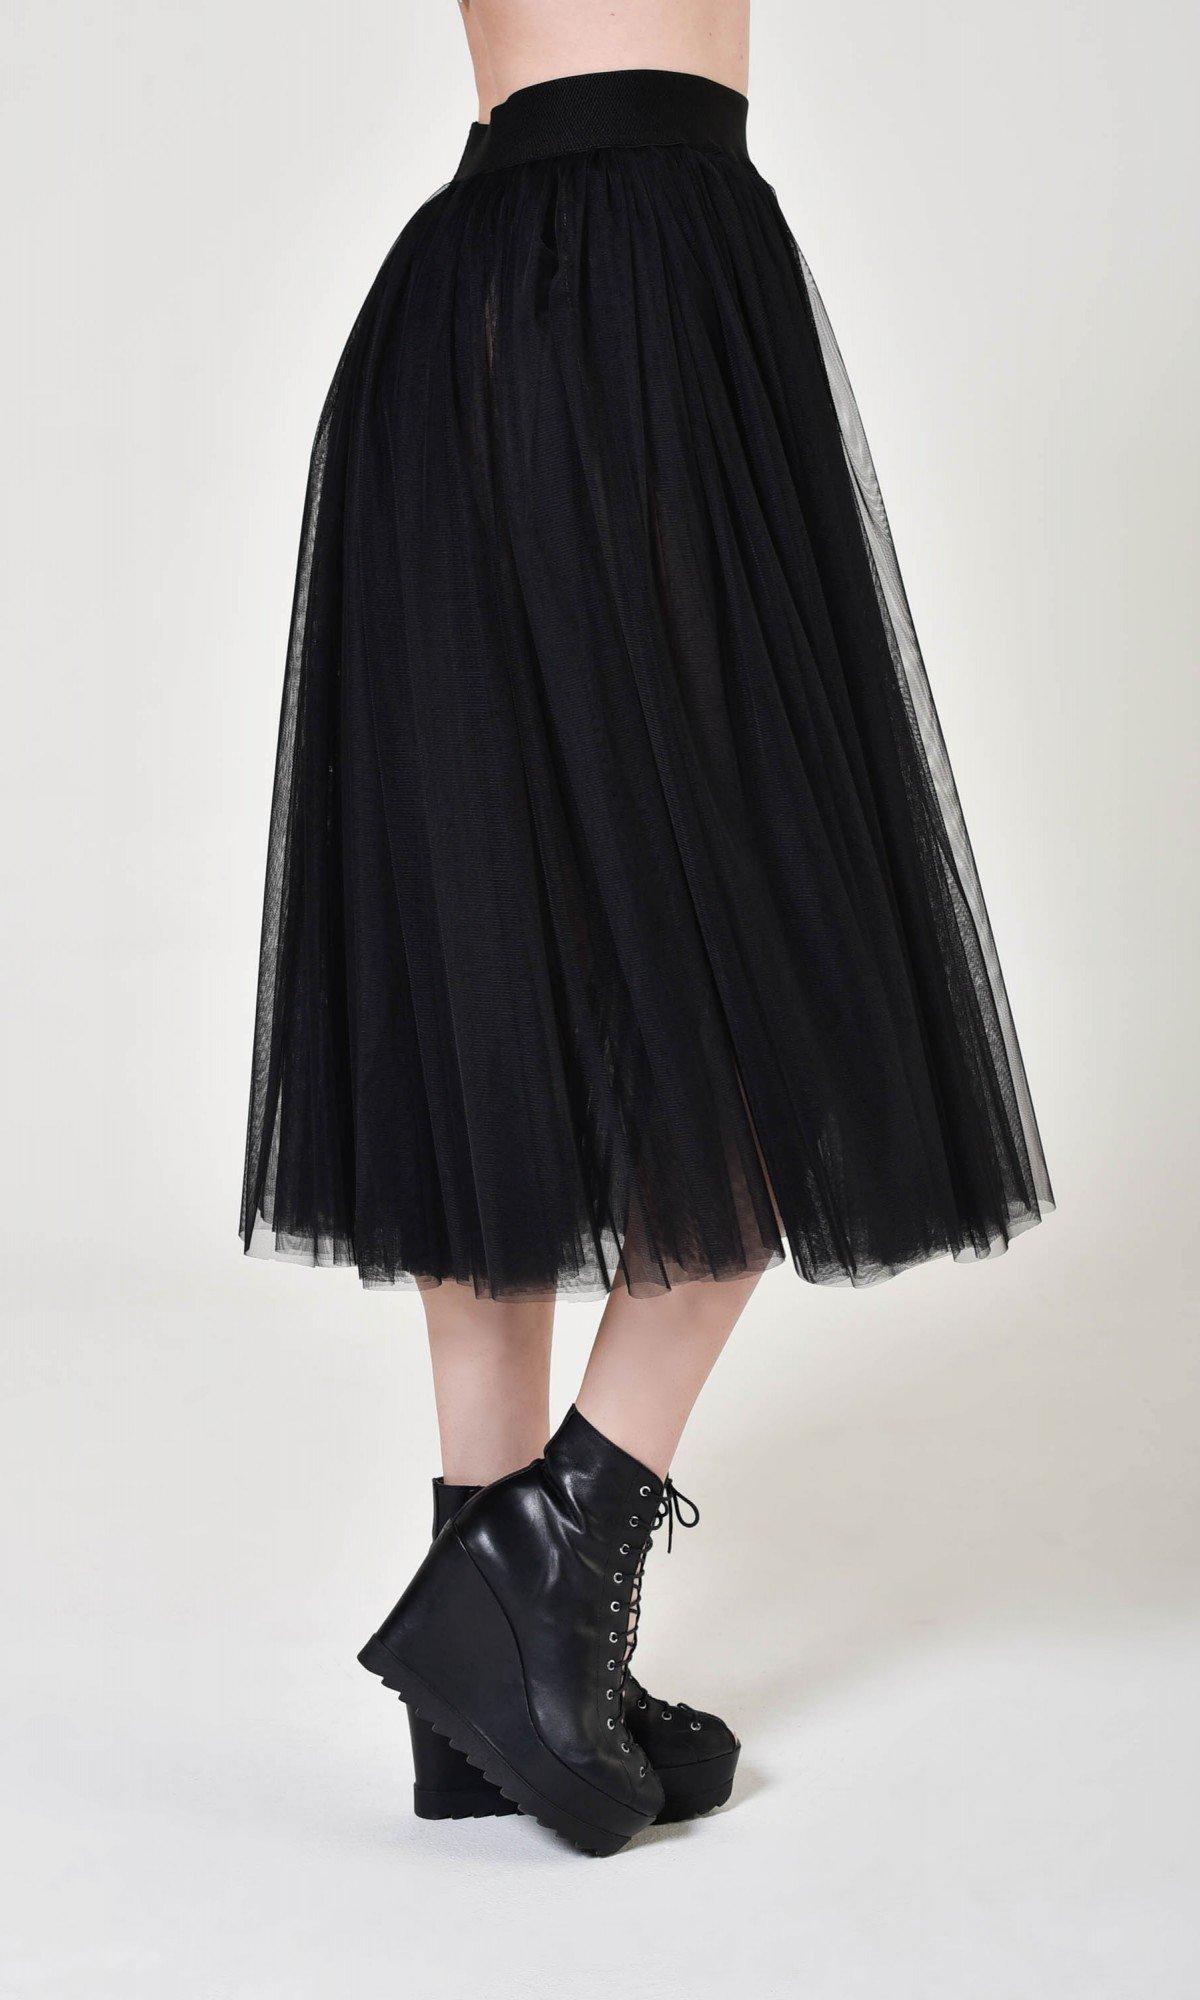 Extravagant Tutu Skirt A90267